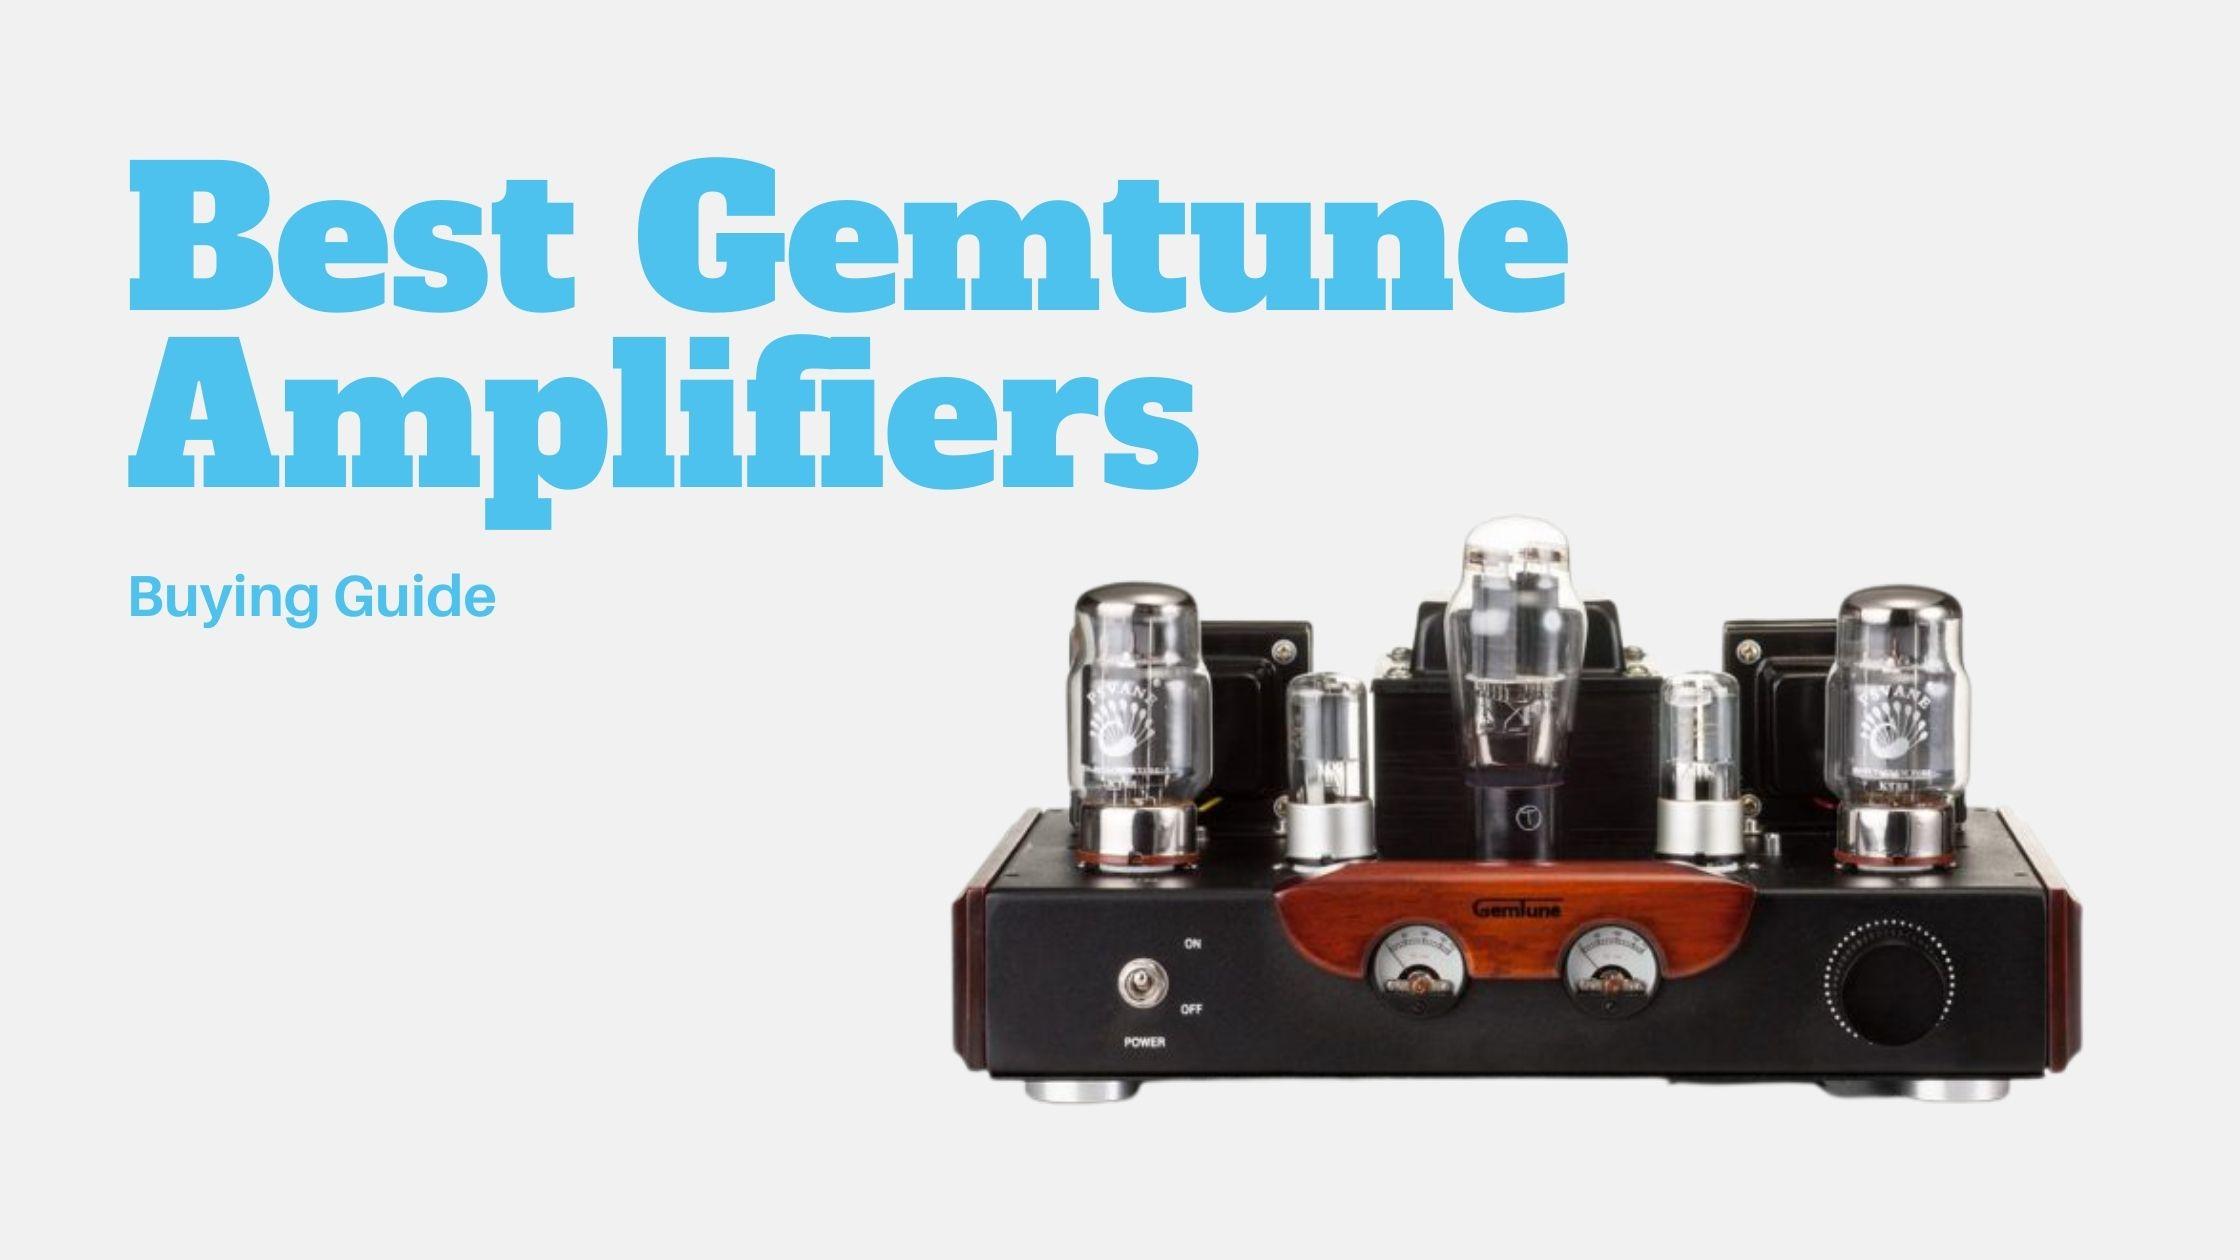 8 Best Gemtune Amplifiers